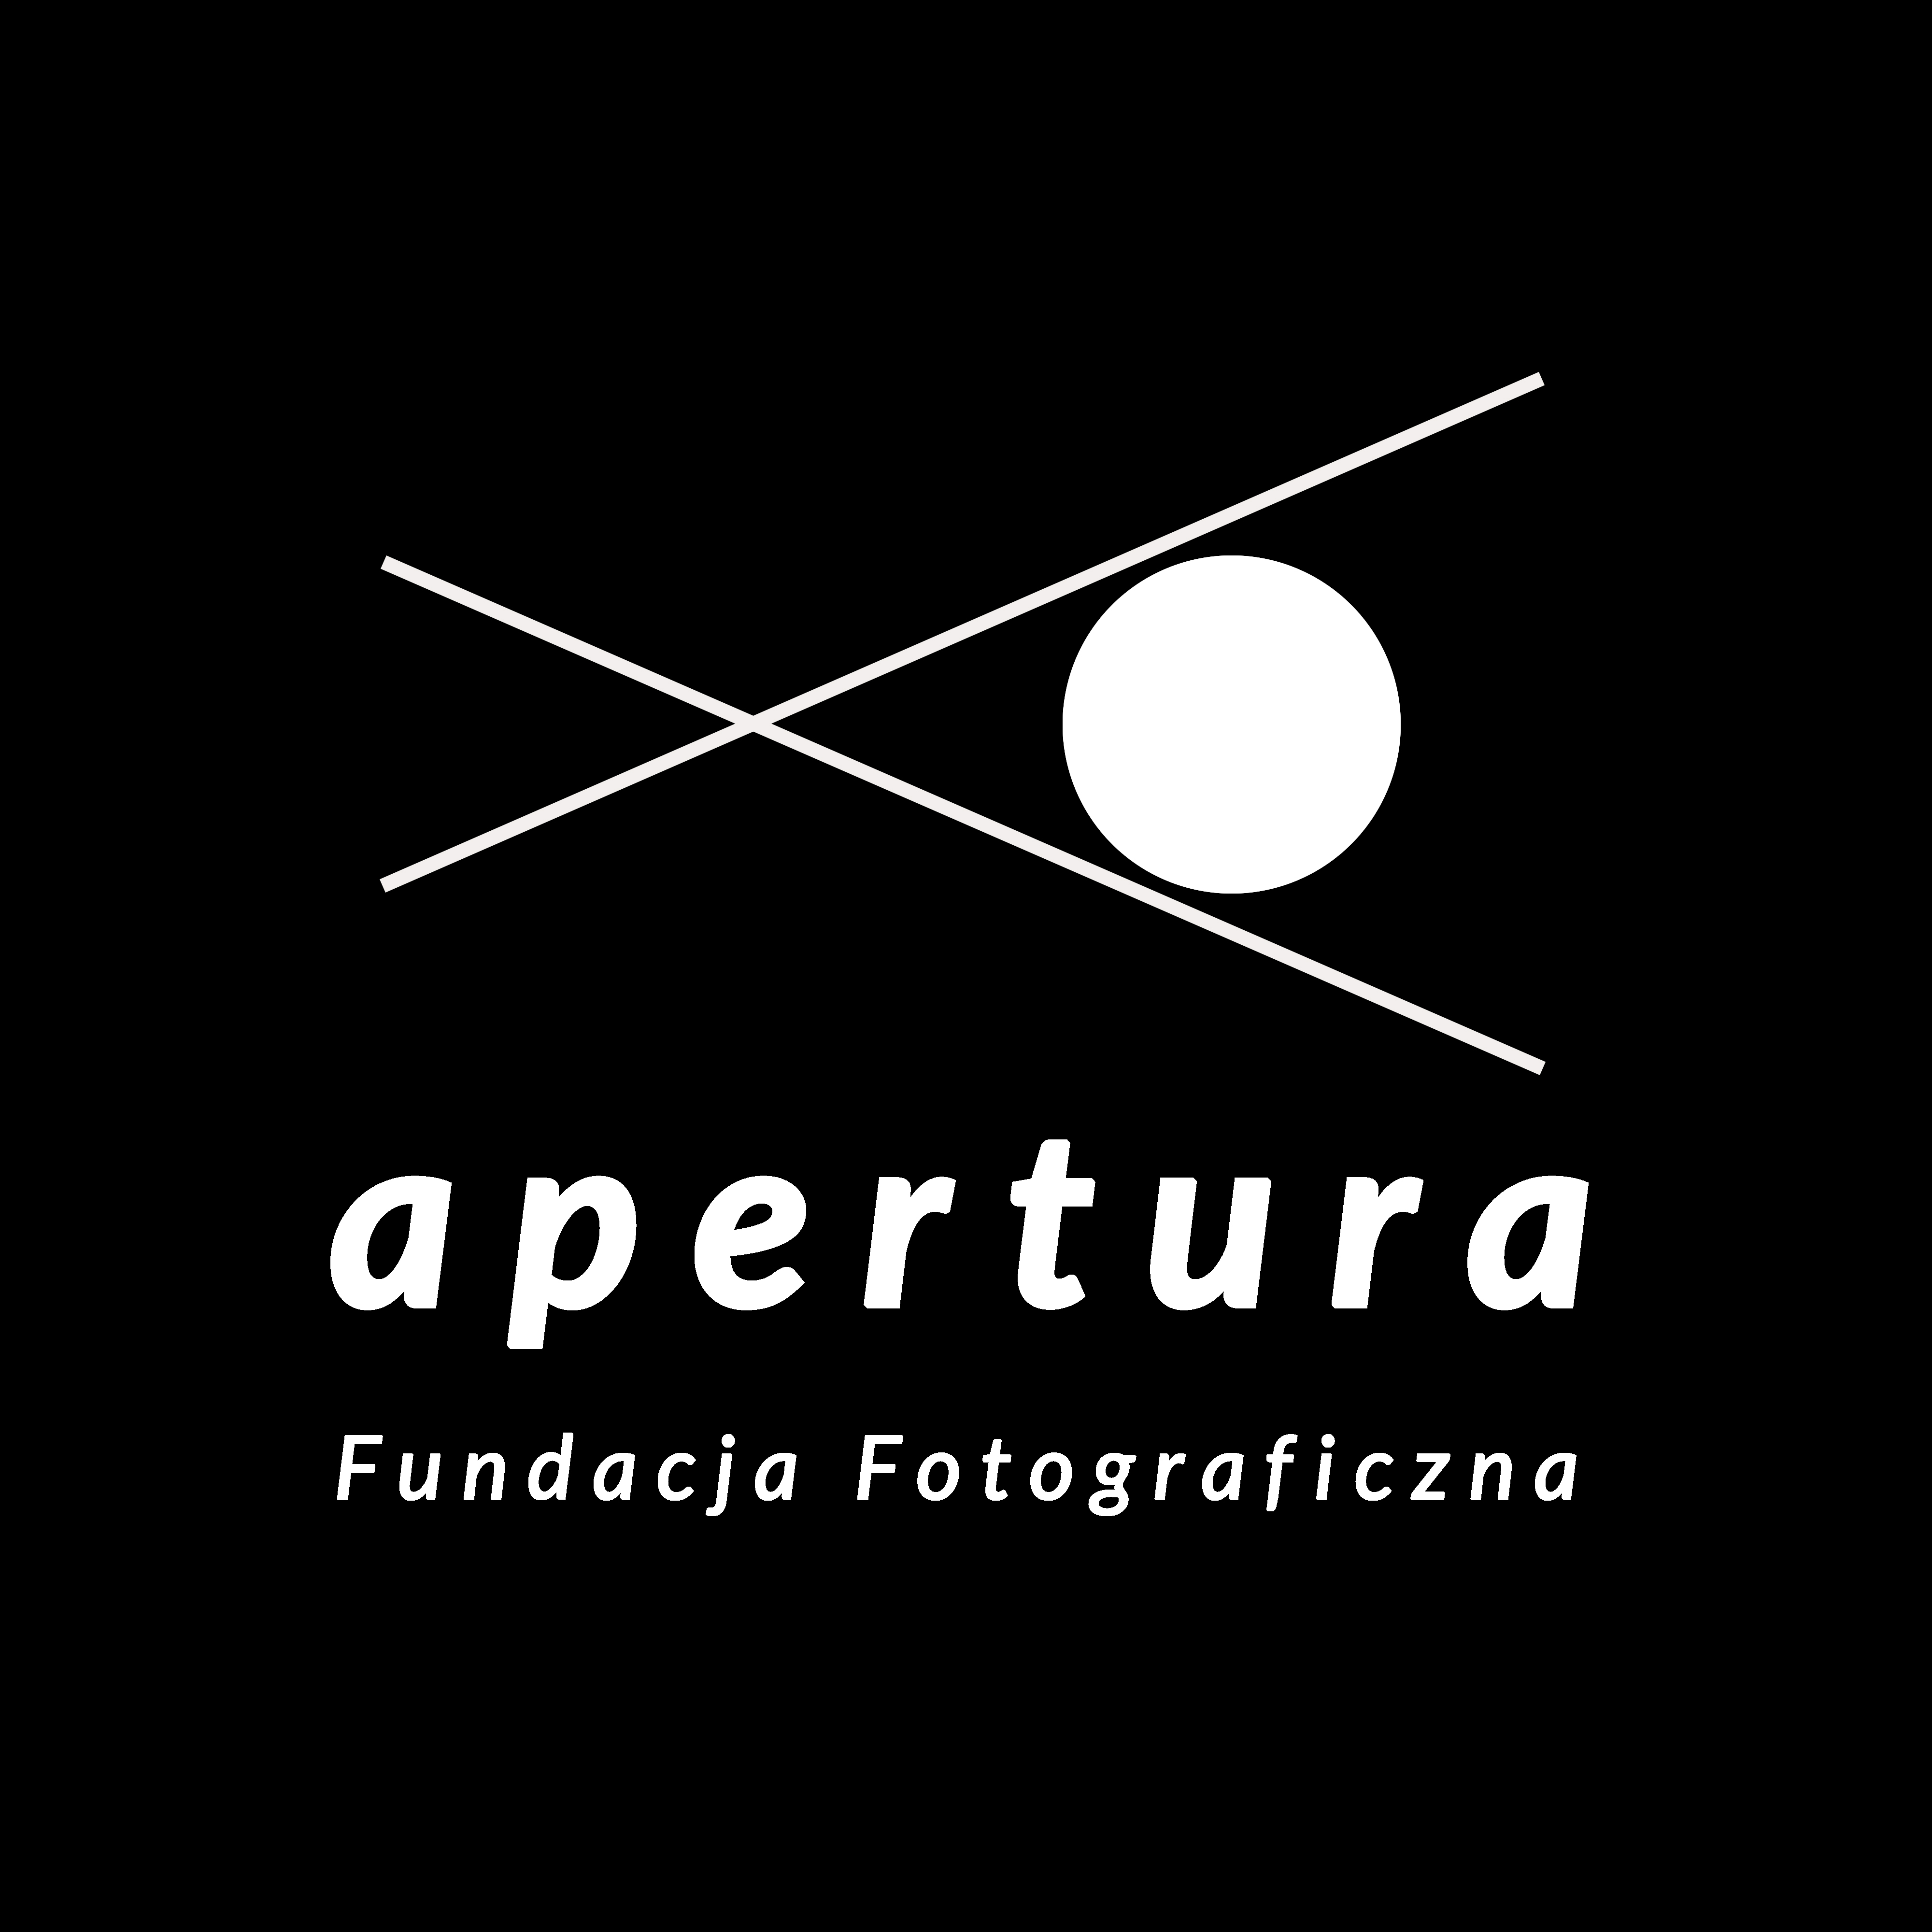 Logotyp Fundacja Fotograficzna Apertura - large black